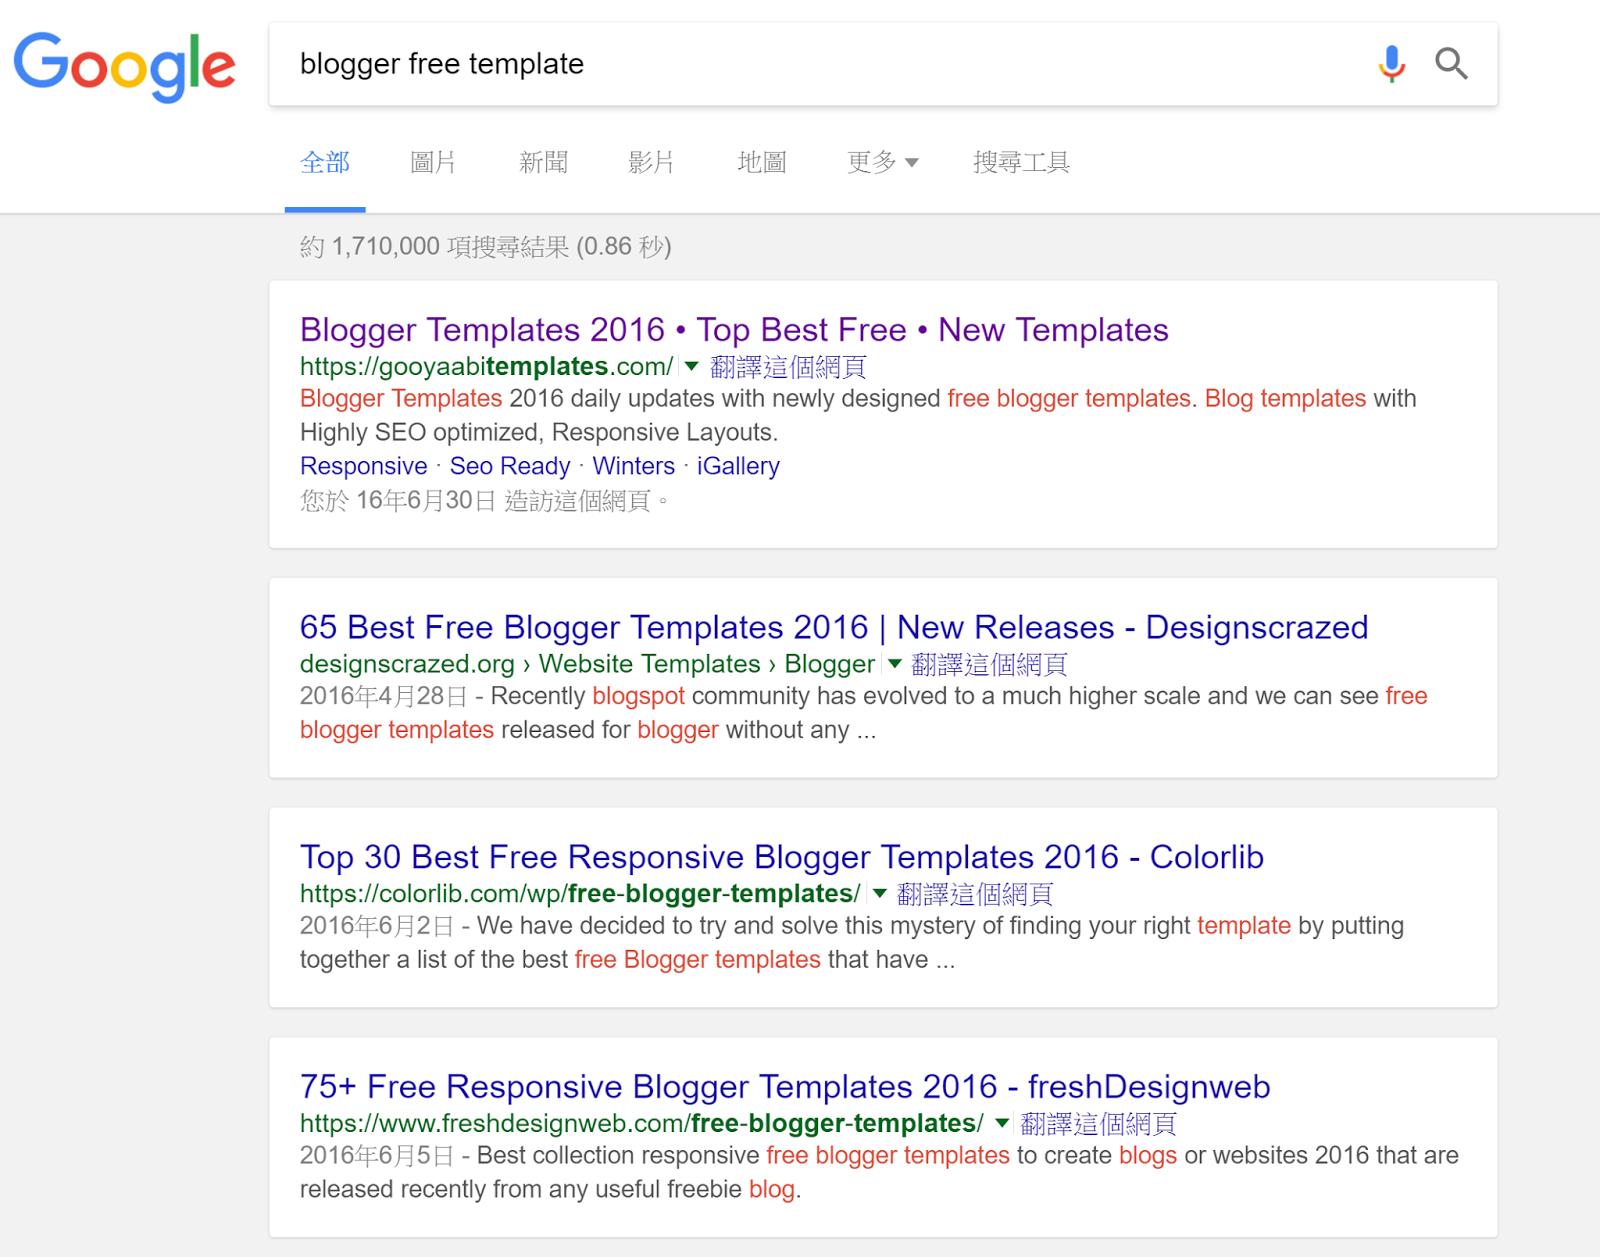 輸入「blogger free template」可找到很多免費範本選擇